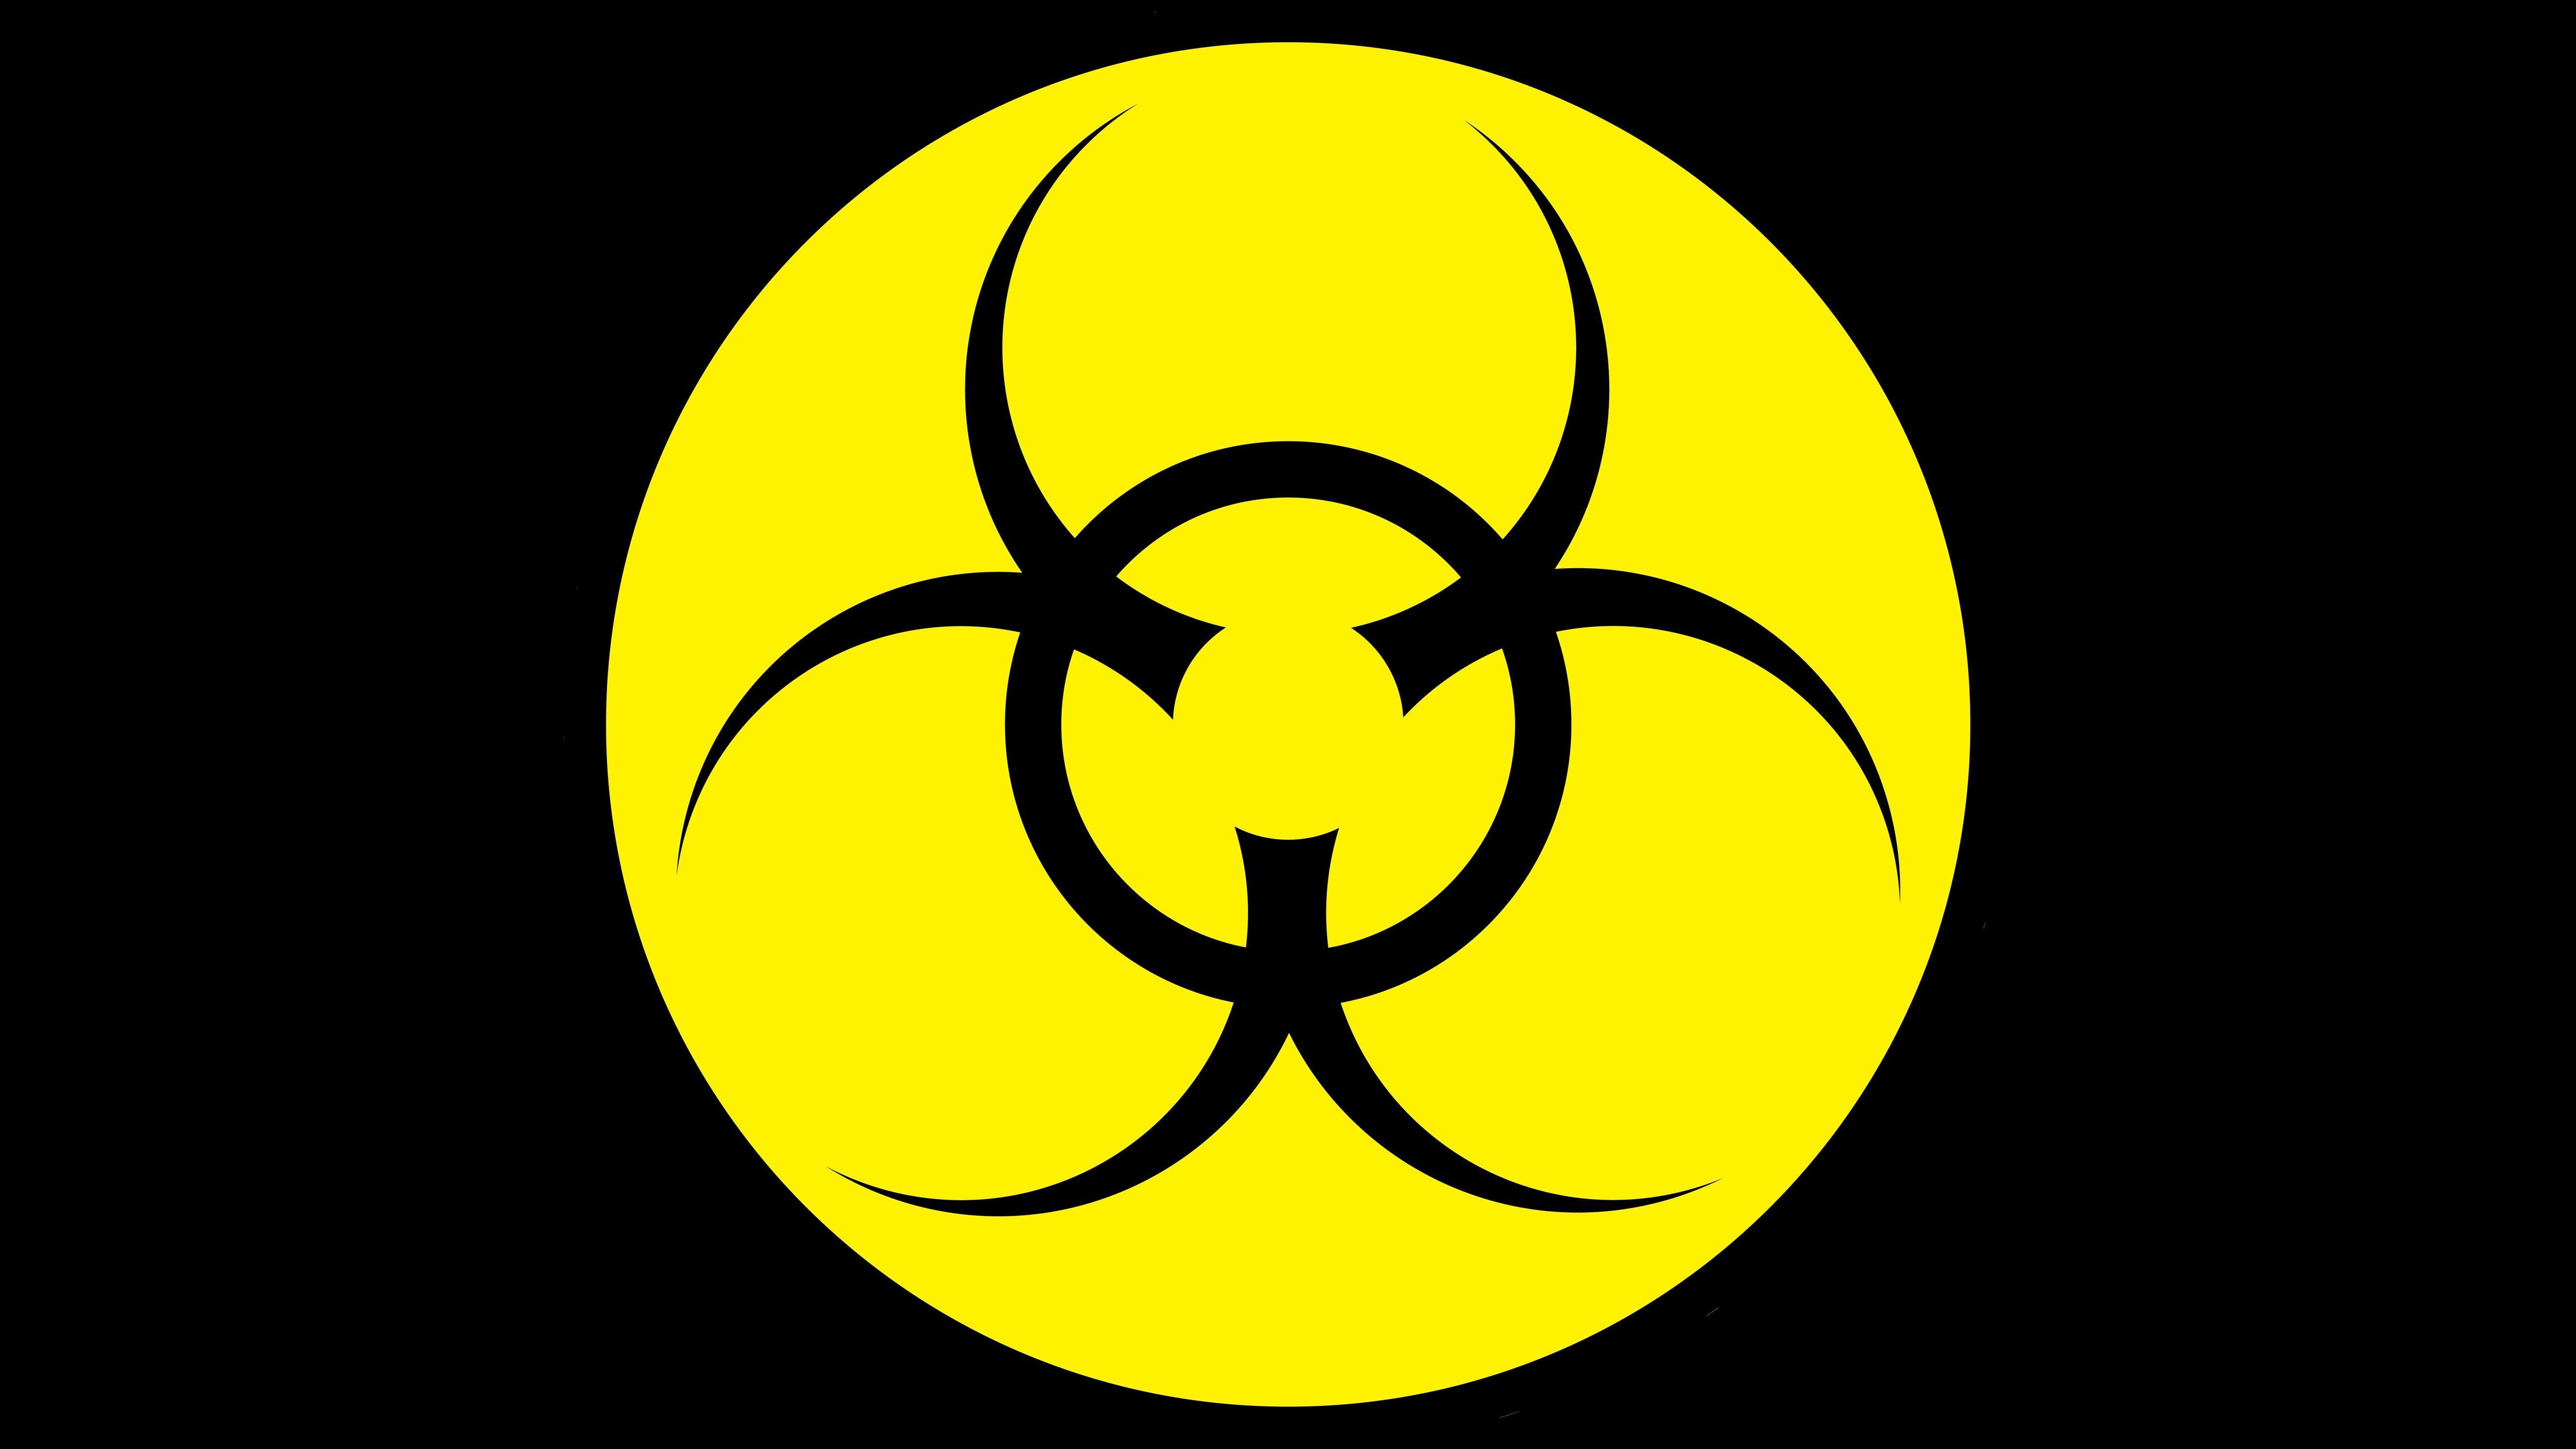 biohazard wallpaper: high definition backgrounds, 5300x2981 (426 kb